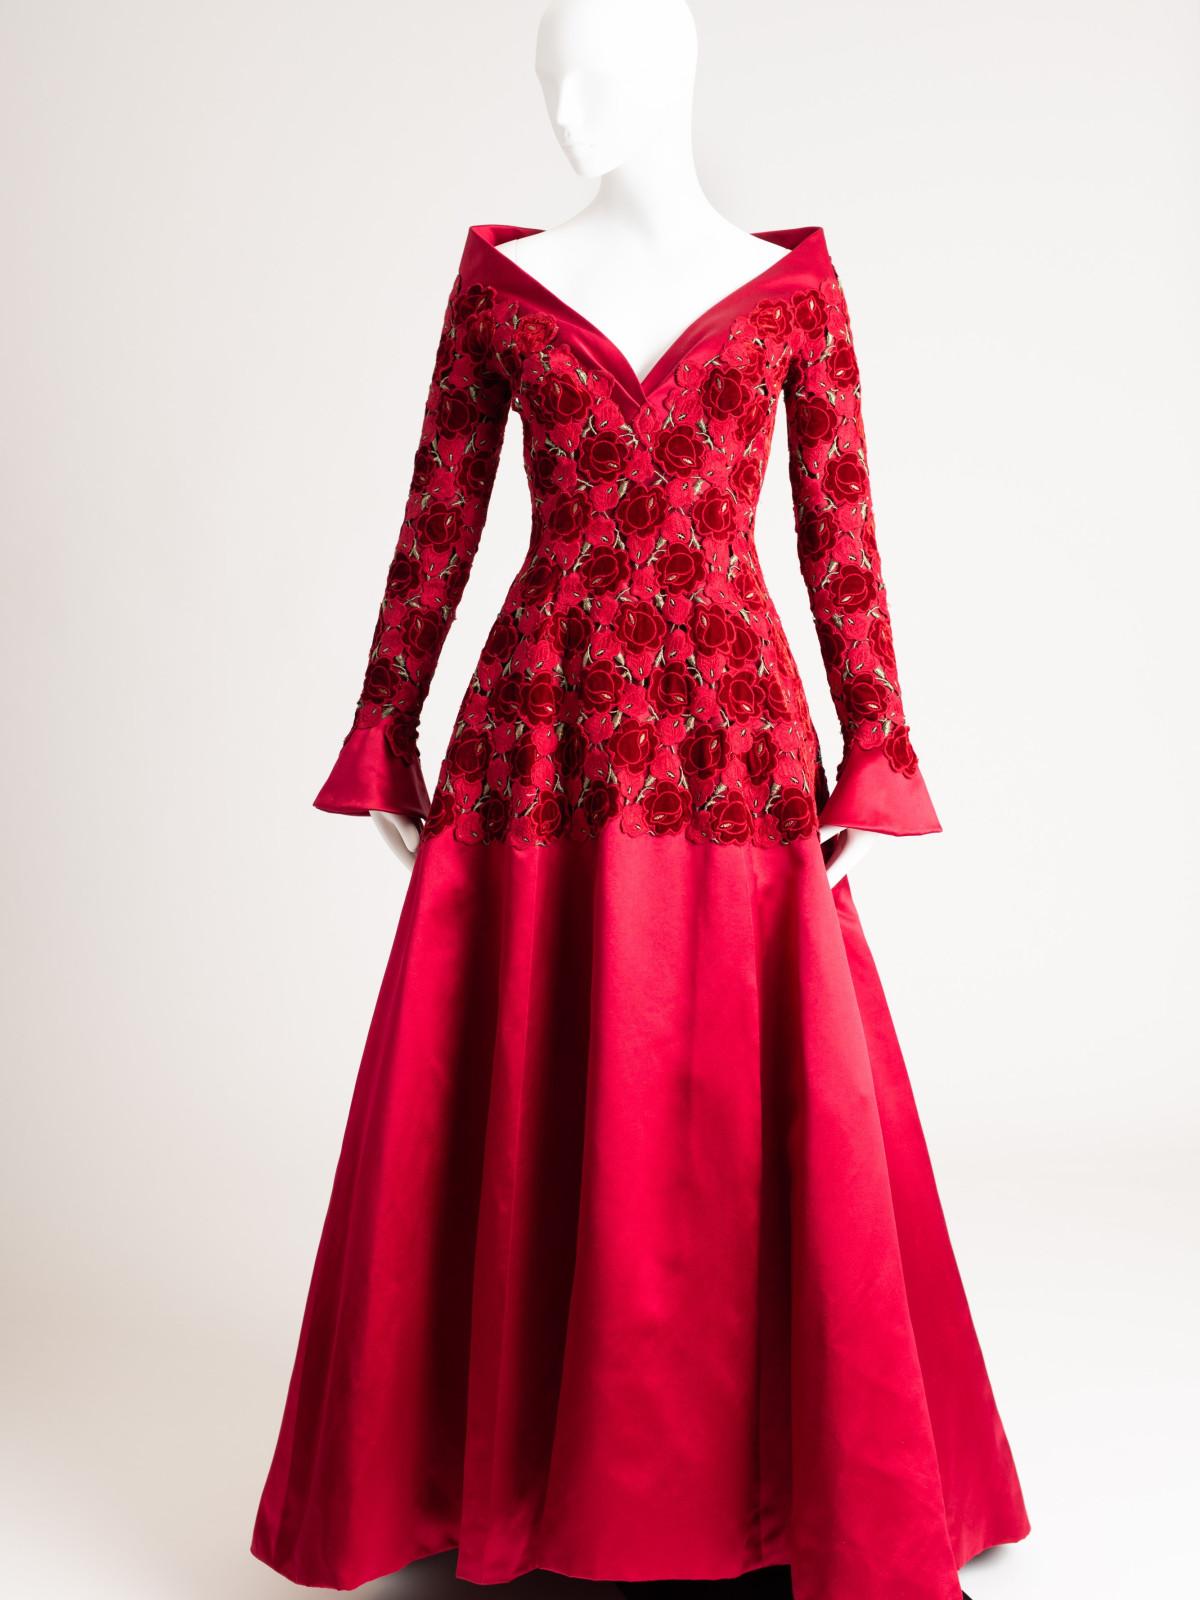 Pierre Balmain, Haute Couture c. 1991_77